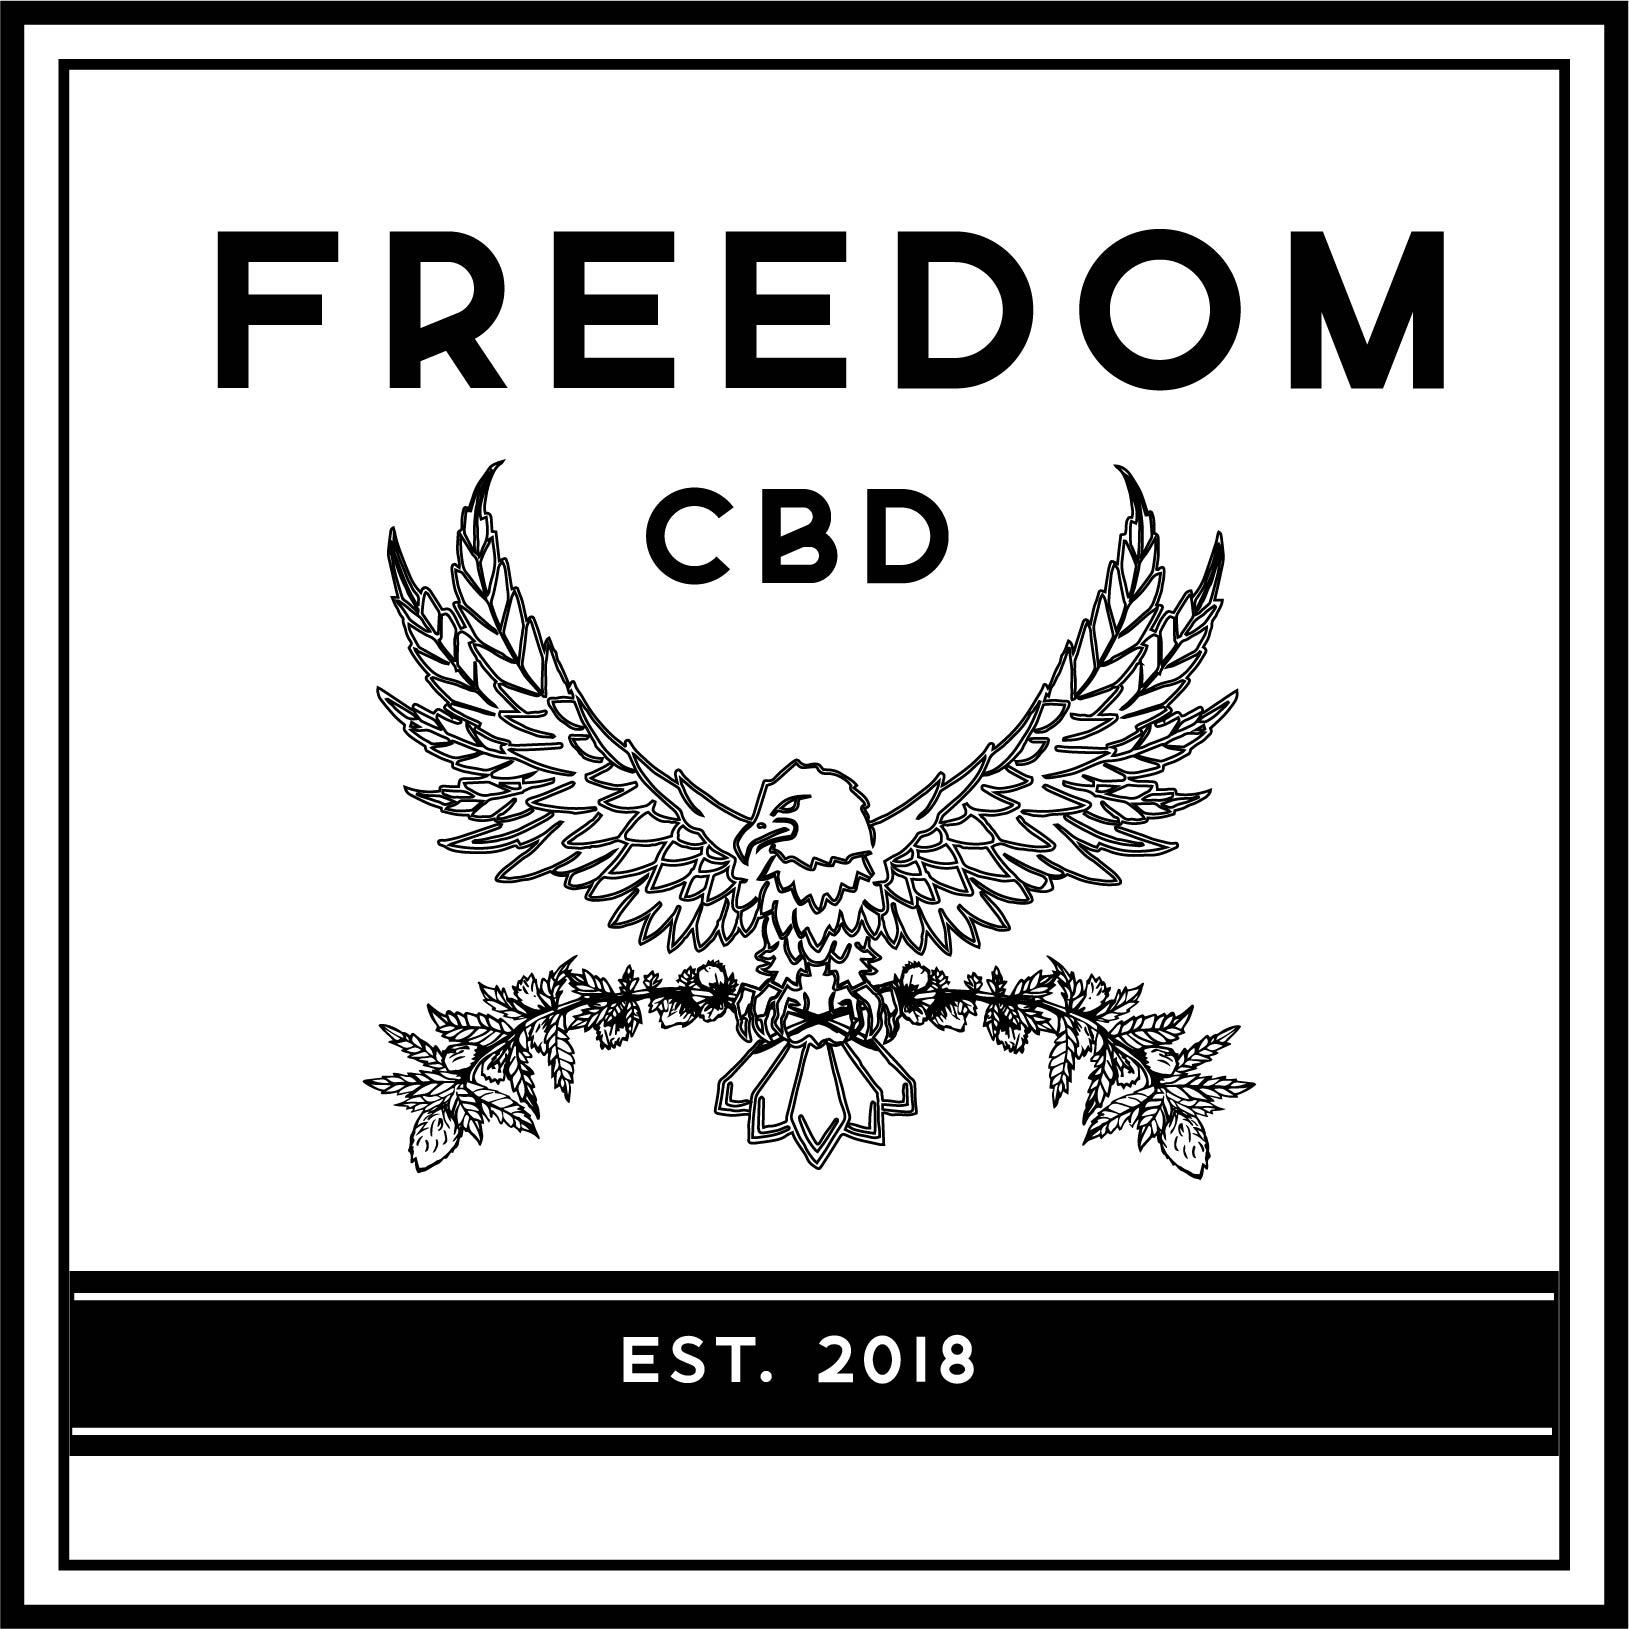 Freedom CBD logo